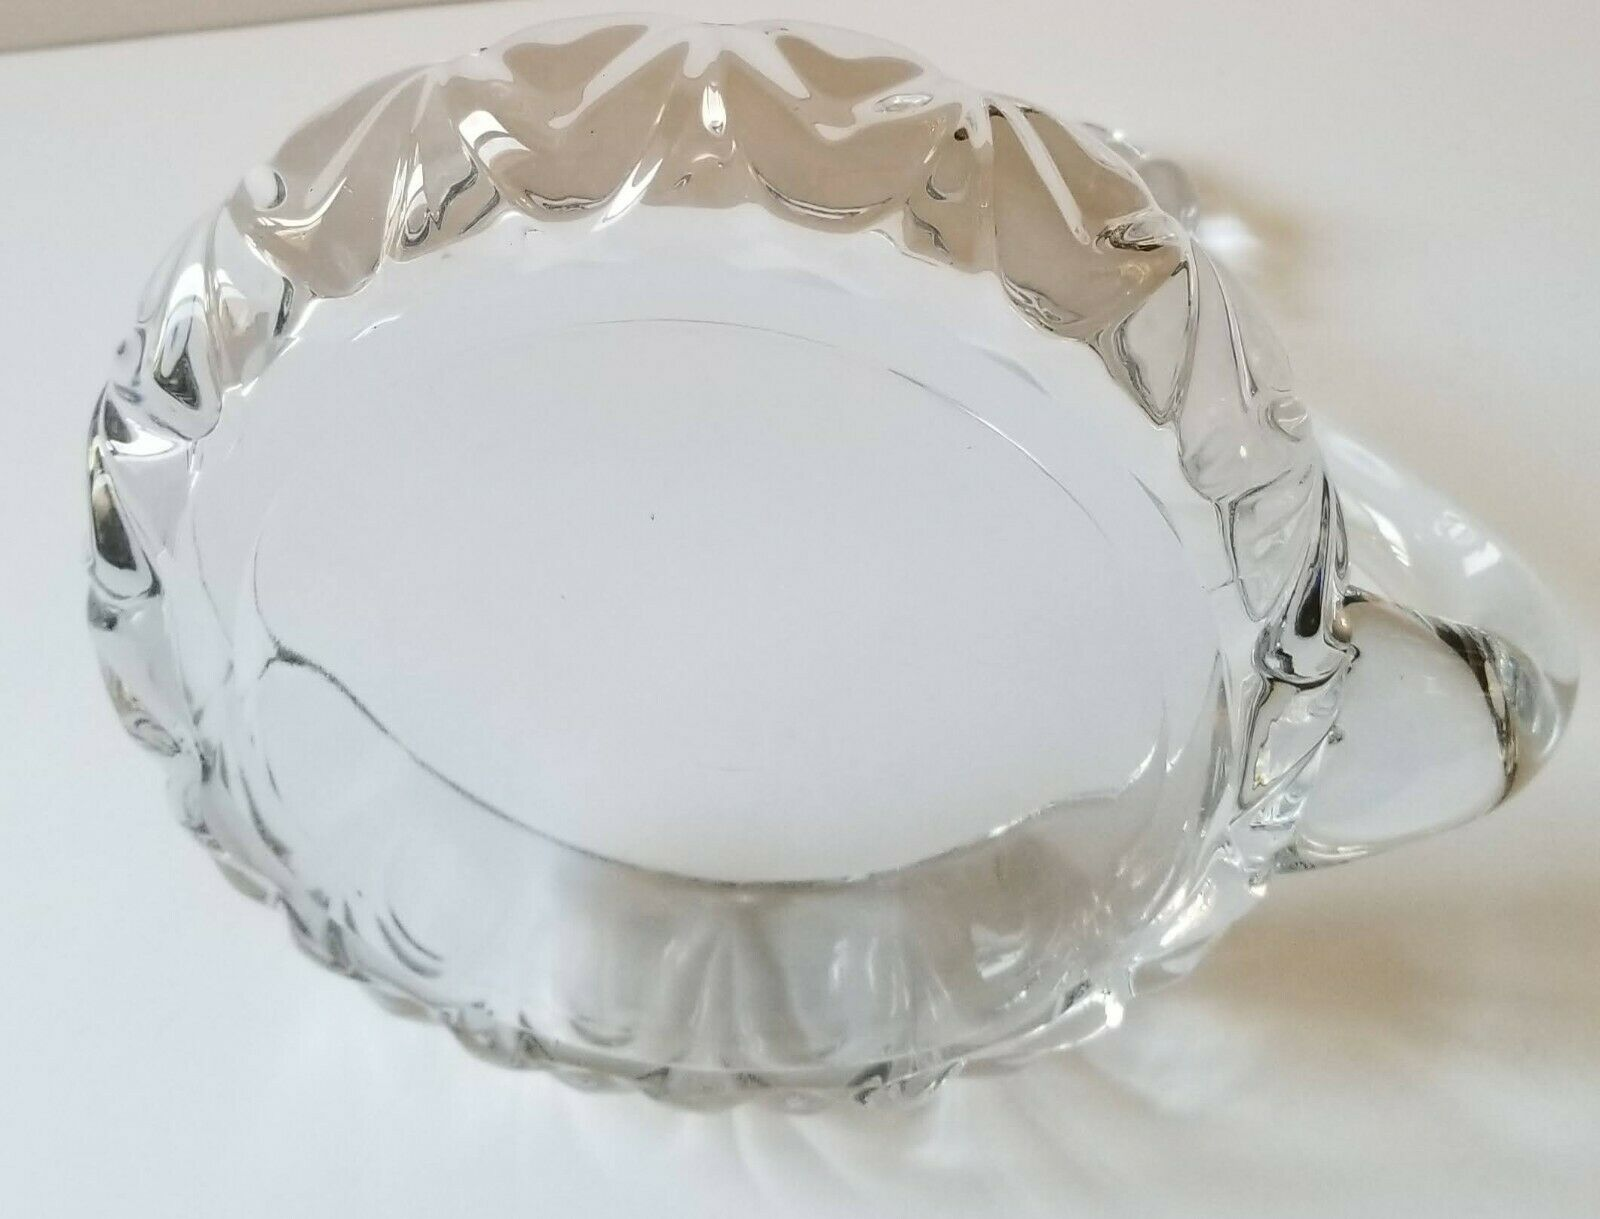 Vintage Clear Crystal Glass Elegant Swan Trinket Candy Dish 5 Wide 6.5 Tall - $9.80